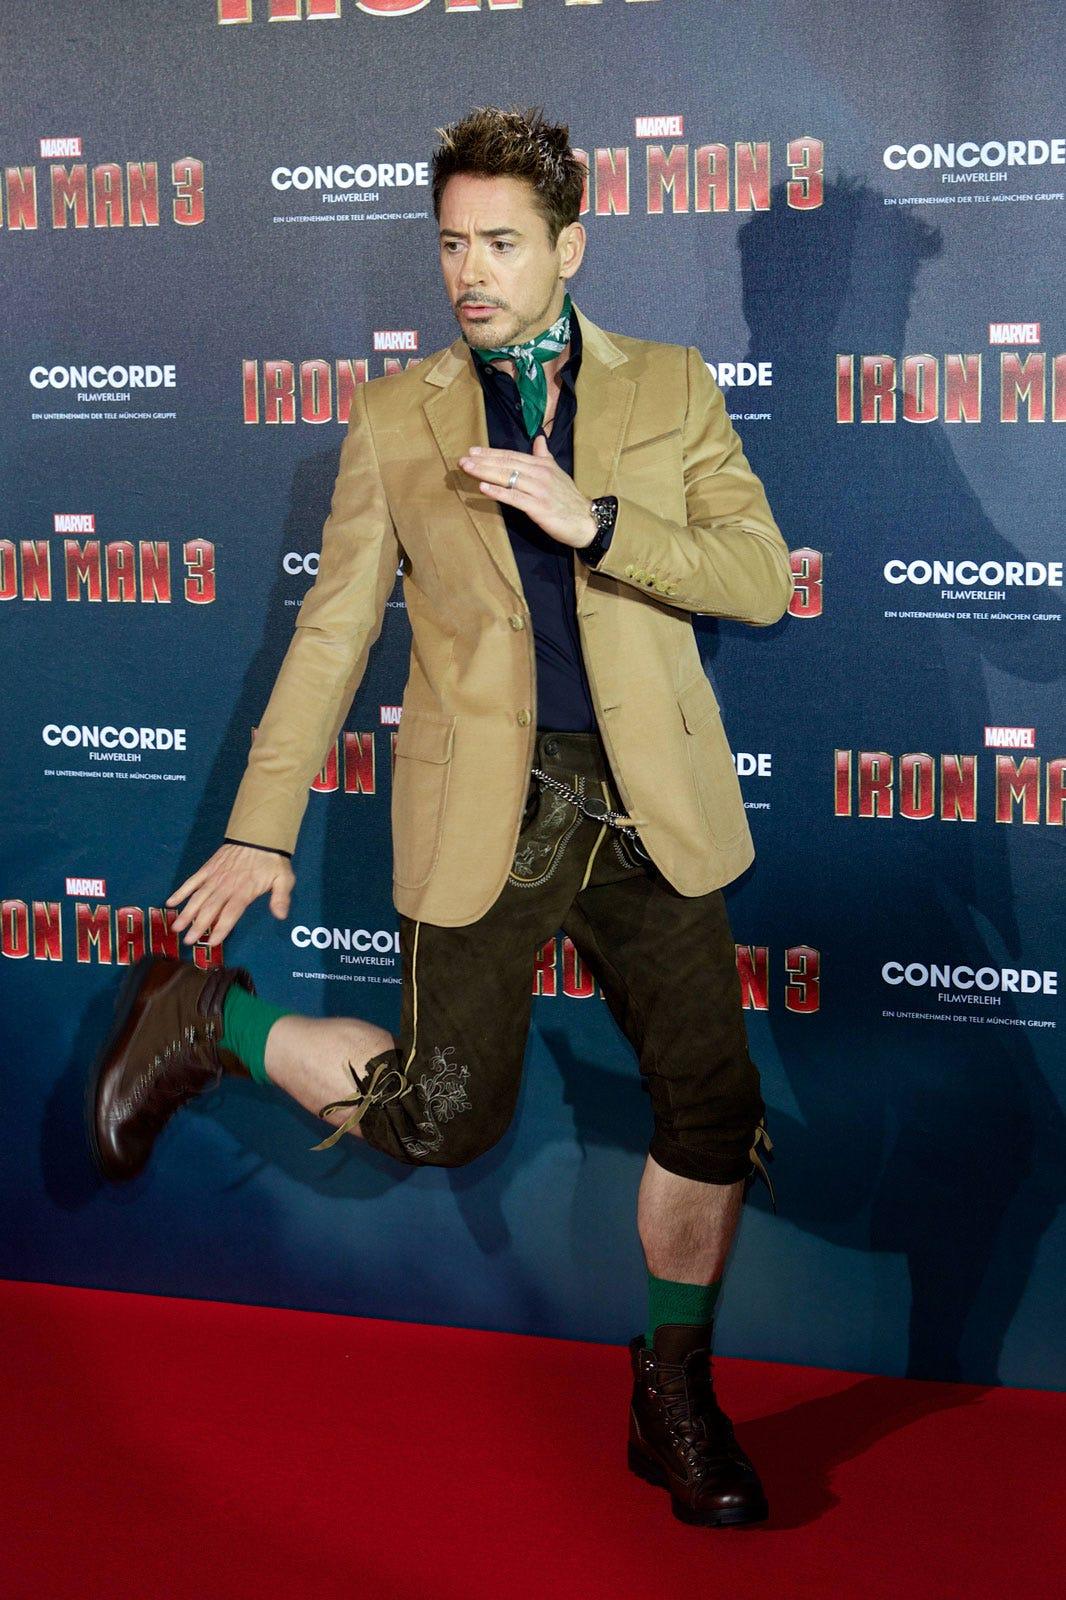 25 Most Embarrassing Celebrity Wardrobe Malfunctions ...